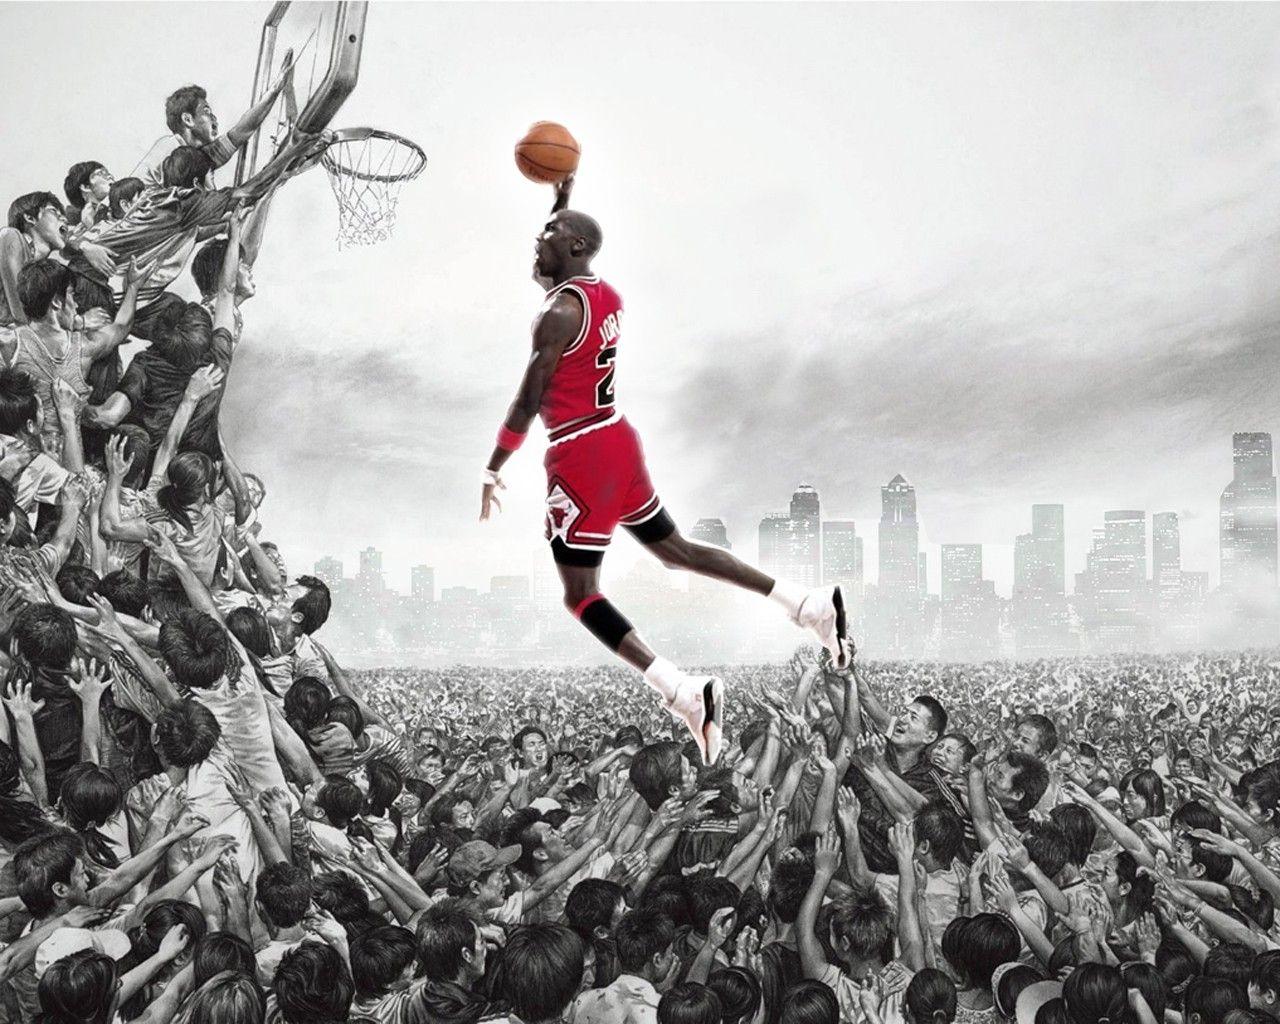 Cool Basketball Wallpapers Group (79+)